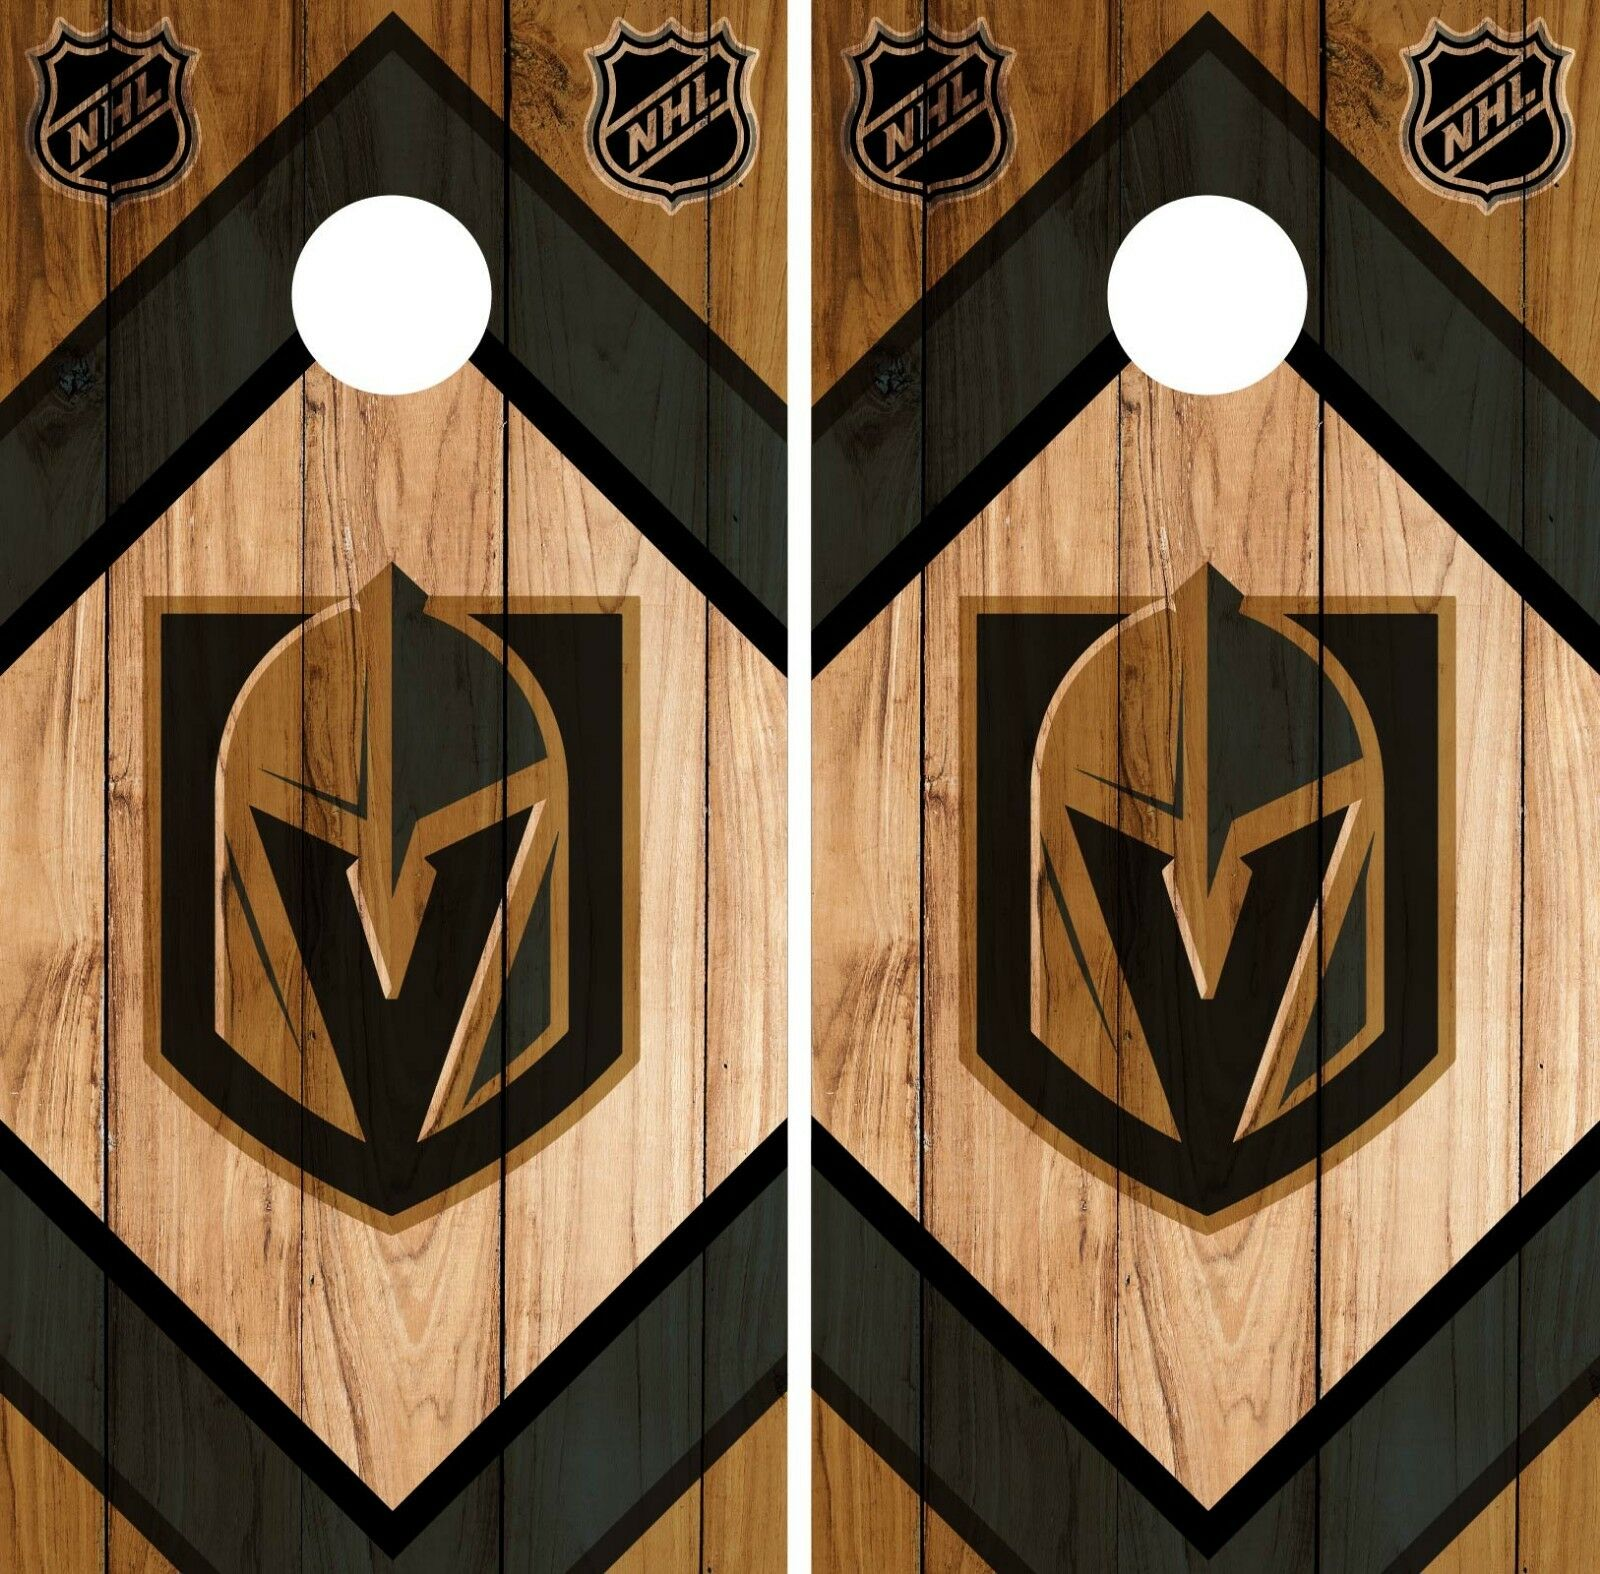 Vegas golden Knights Cornhole Wrap NHL Game Board Skin Set Vinyl Decal CO219